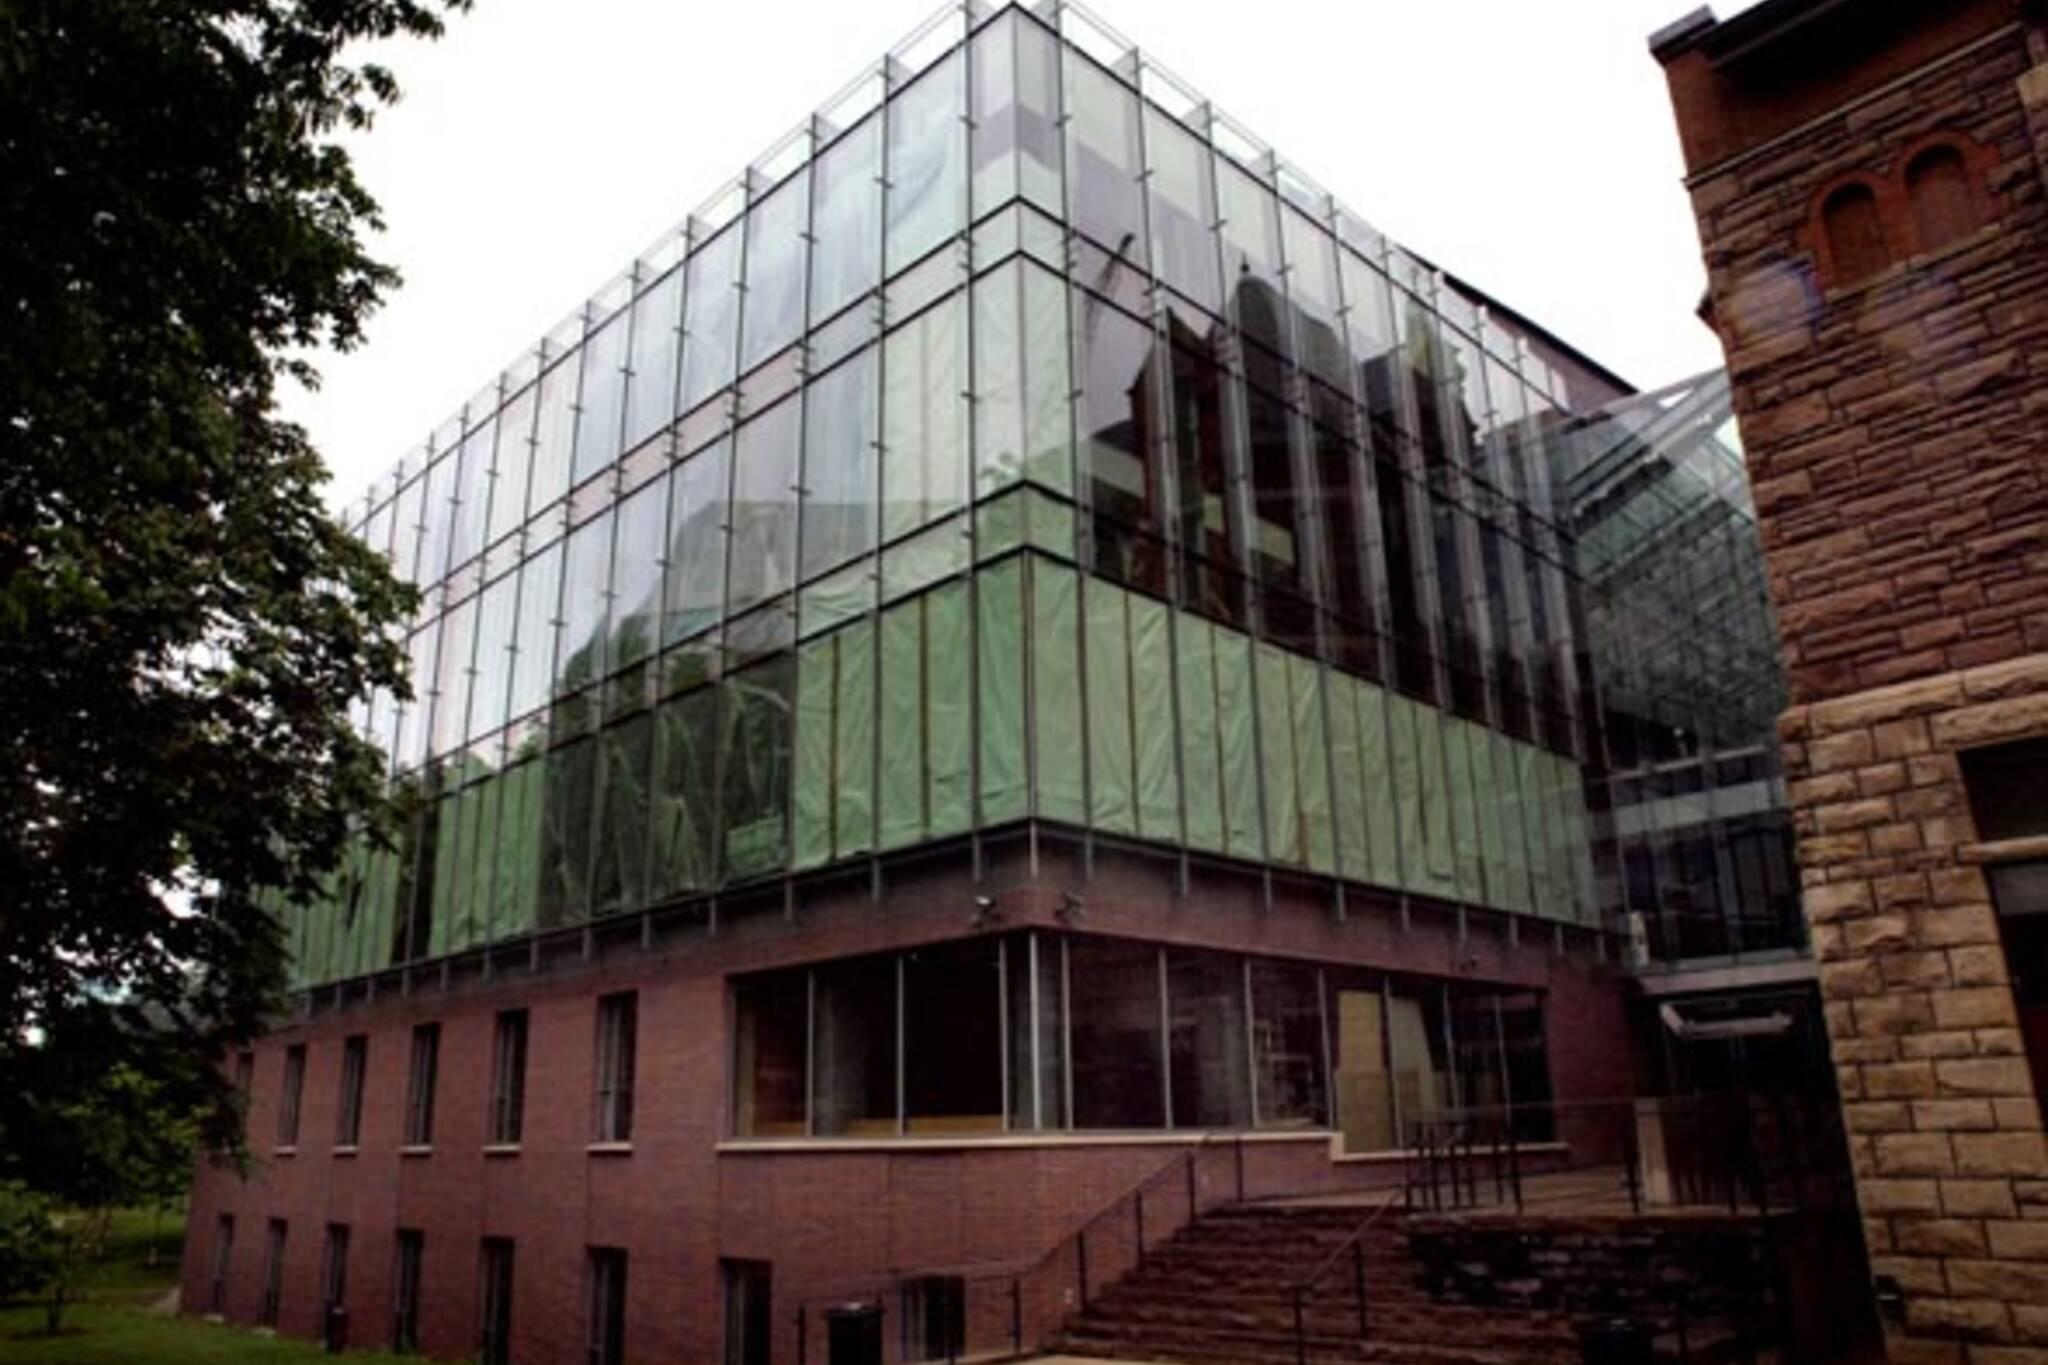 Koerner Hall